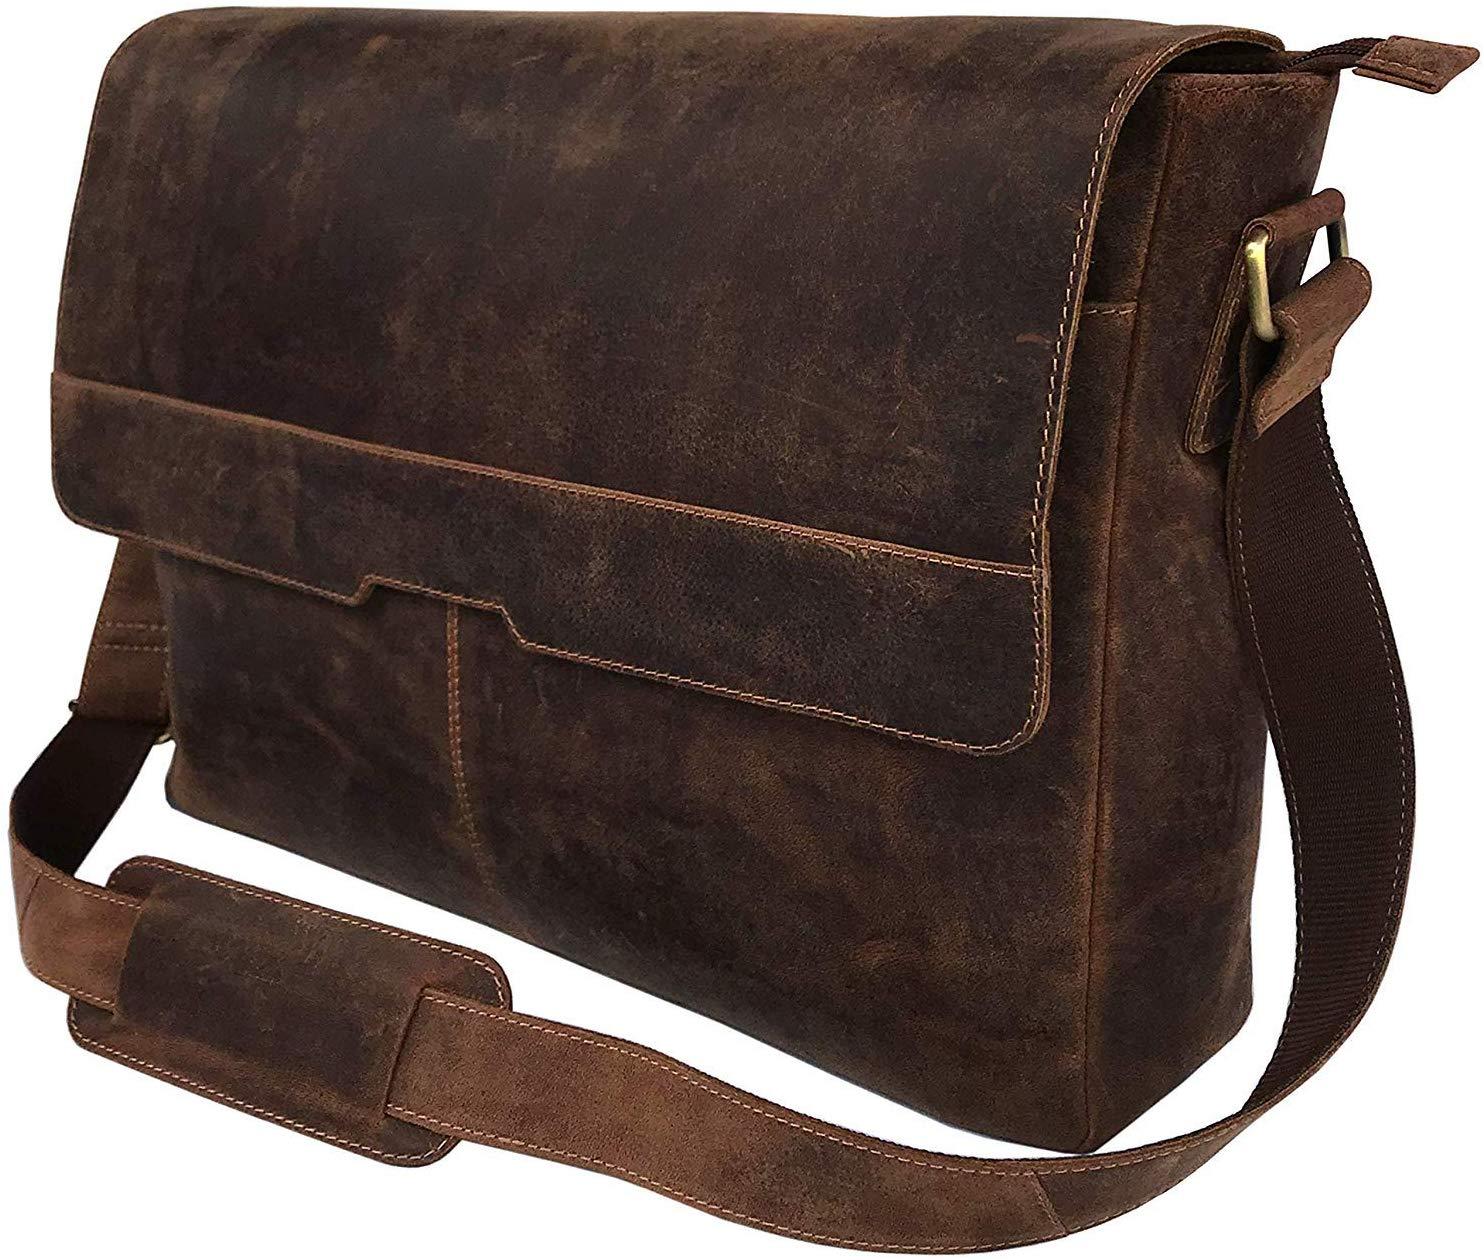 Business Bag, Briefcase